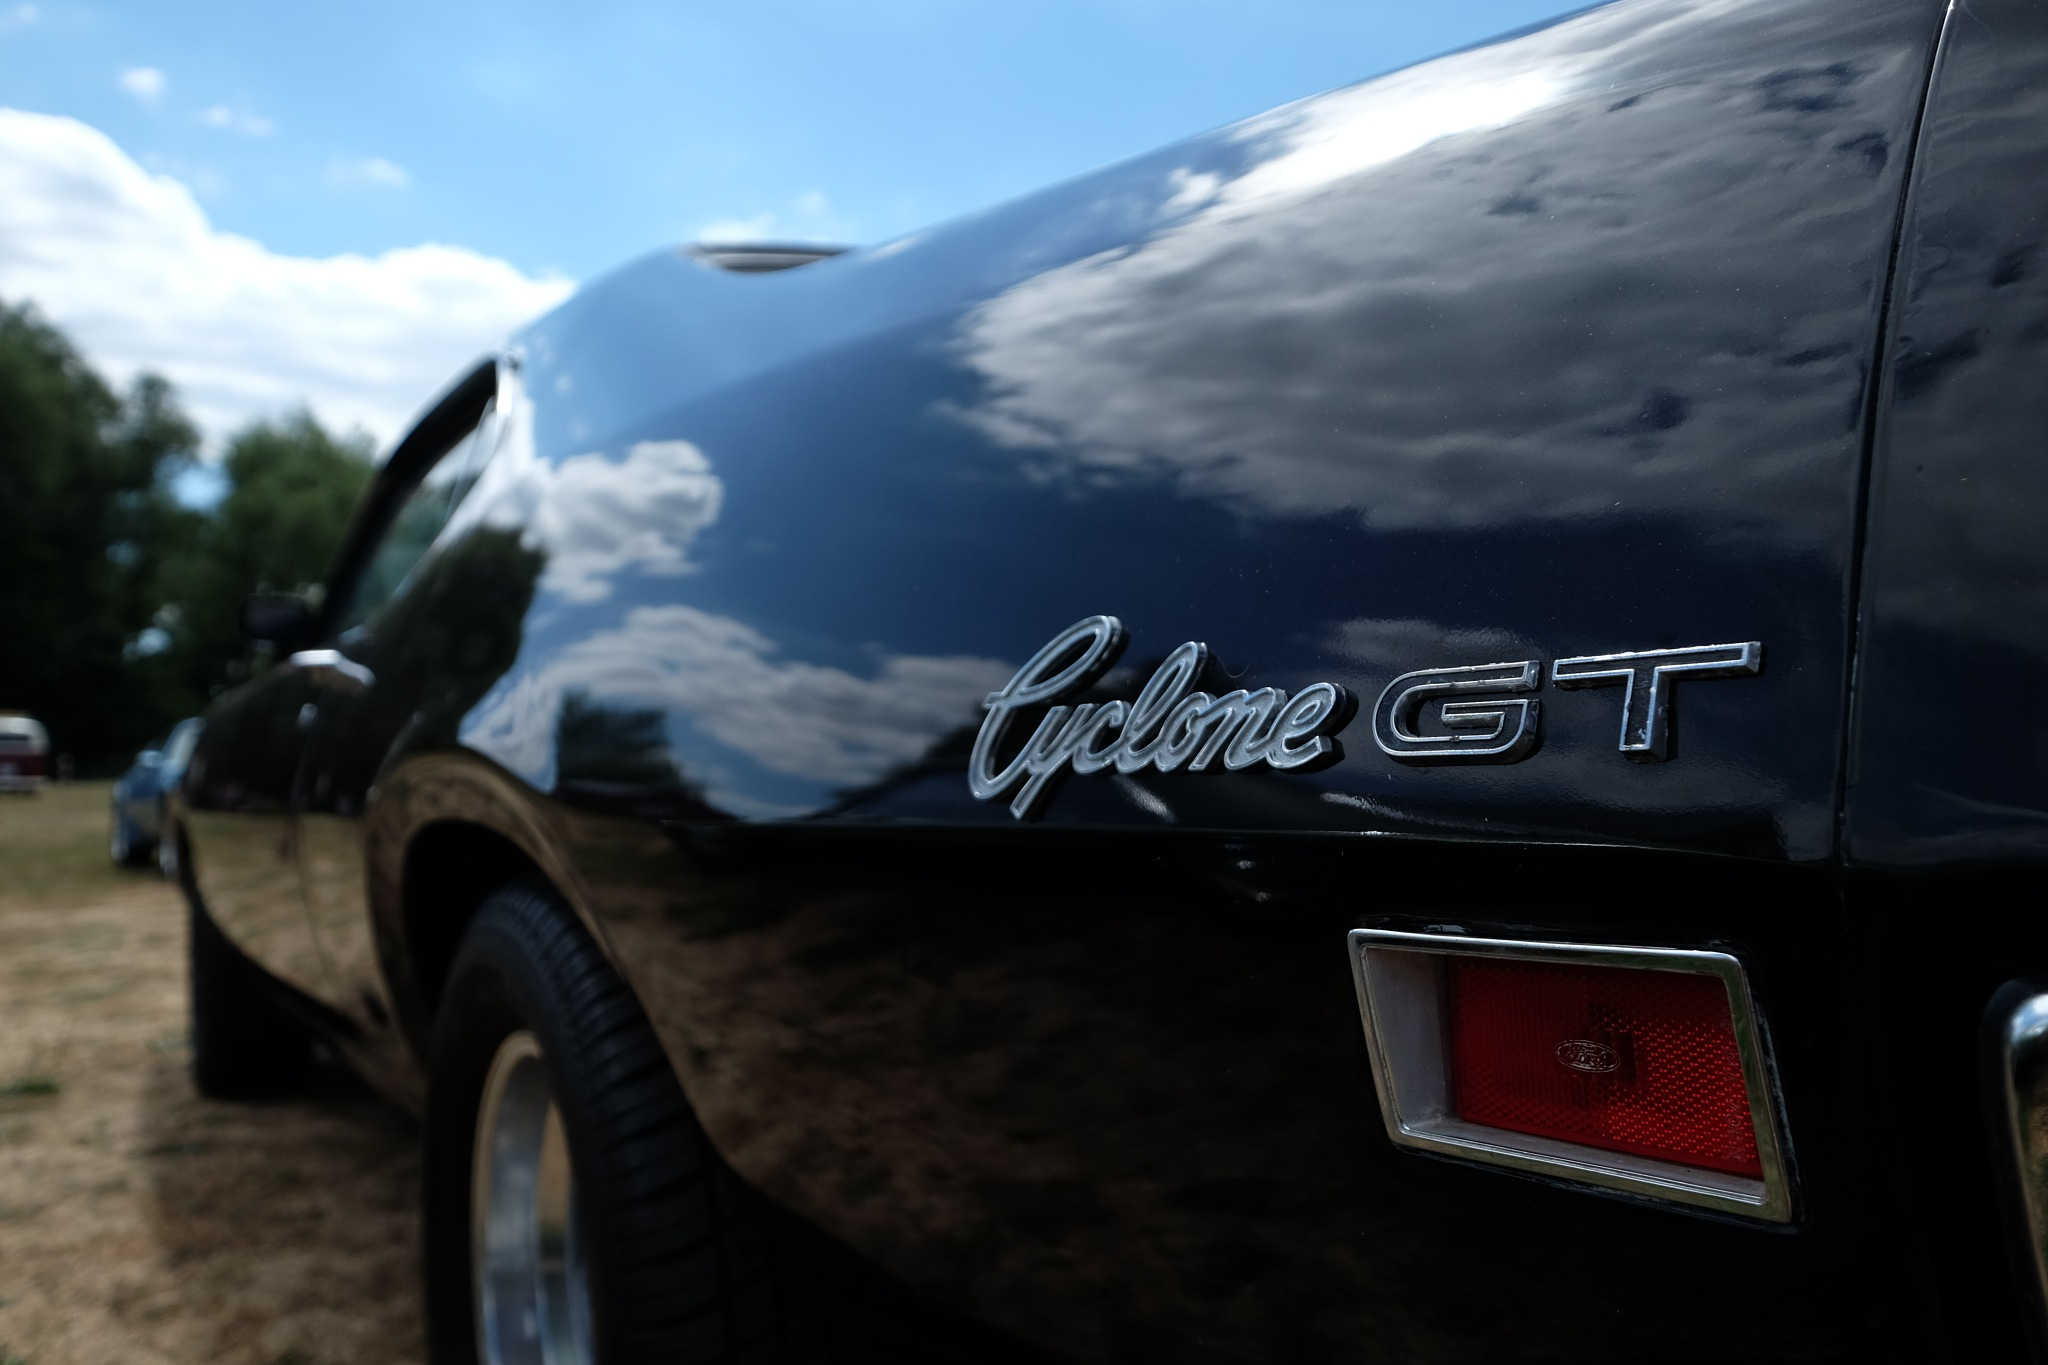 Cycllone GT by peterkryzun